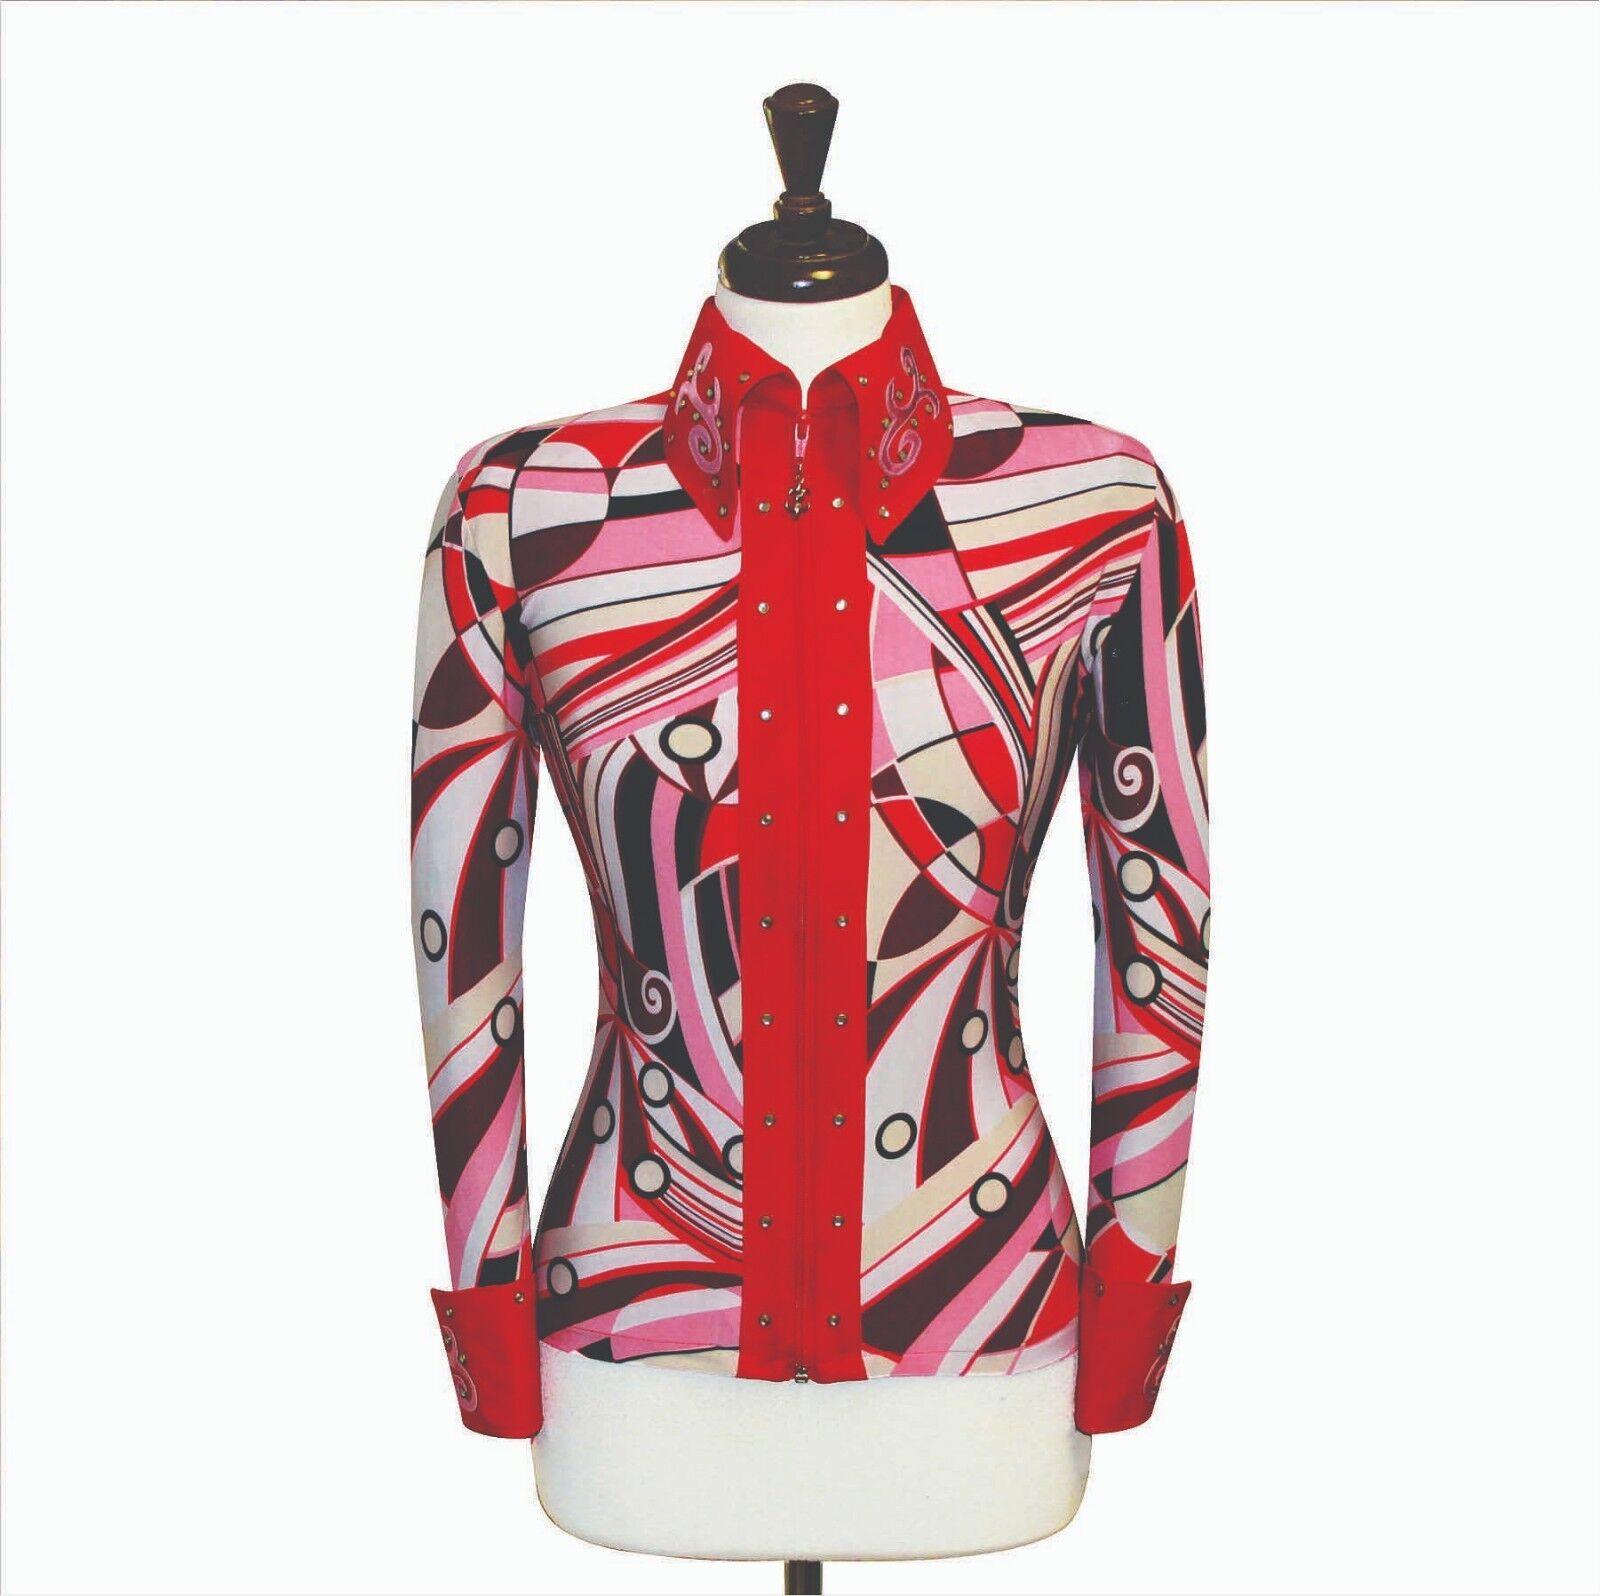 2X-Grande  teatralidad placer Equitación Chaqueta Camisa Rodeo Reina Traje de carril